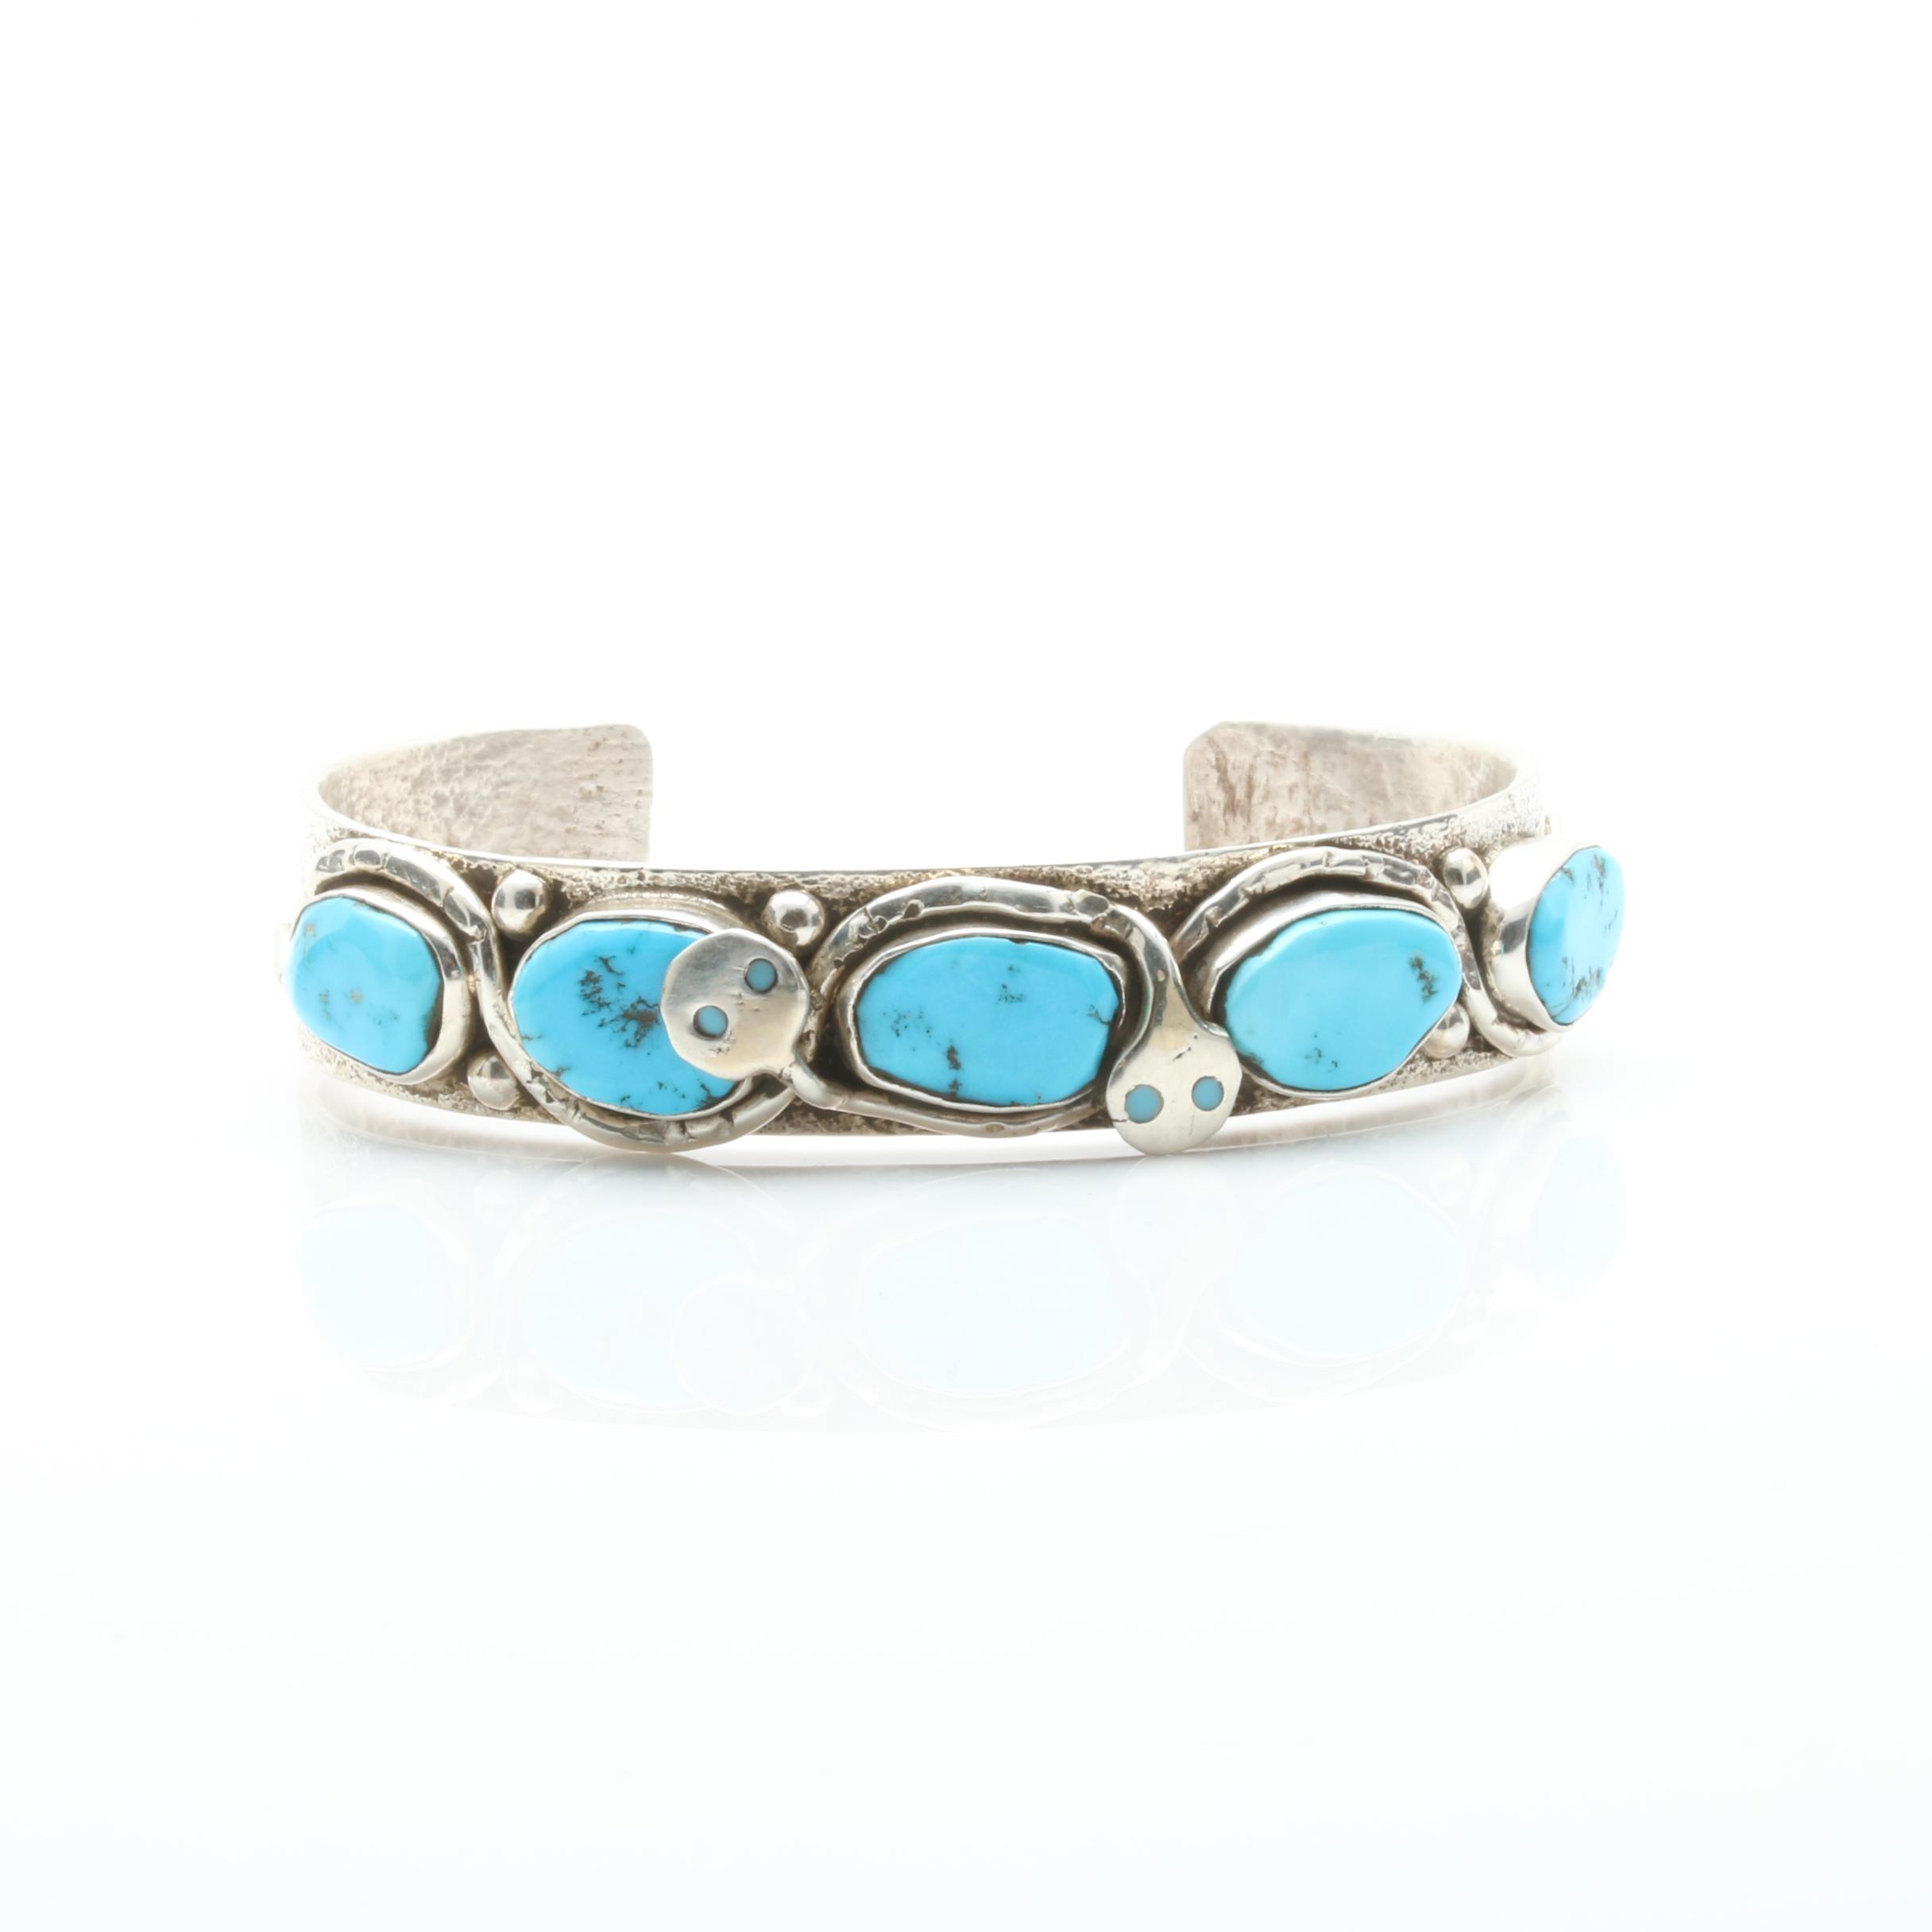 Jude Candelaria Zuni Sterling Silver Sandcast Turquoise Cuff Bracelet